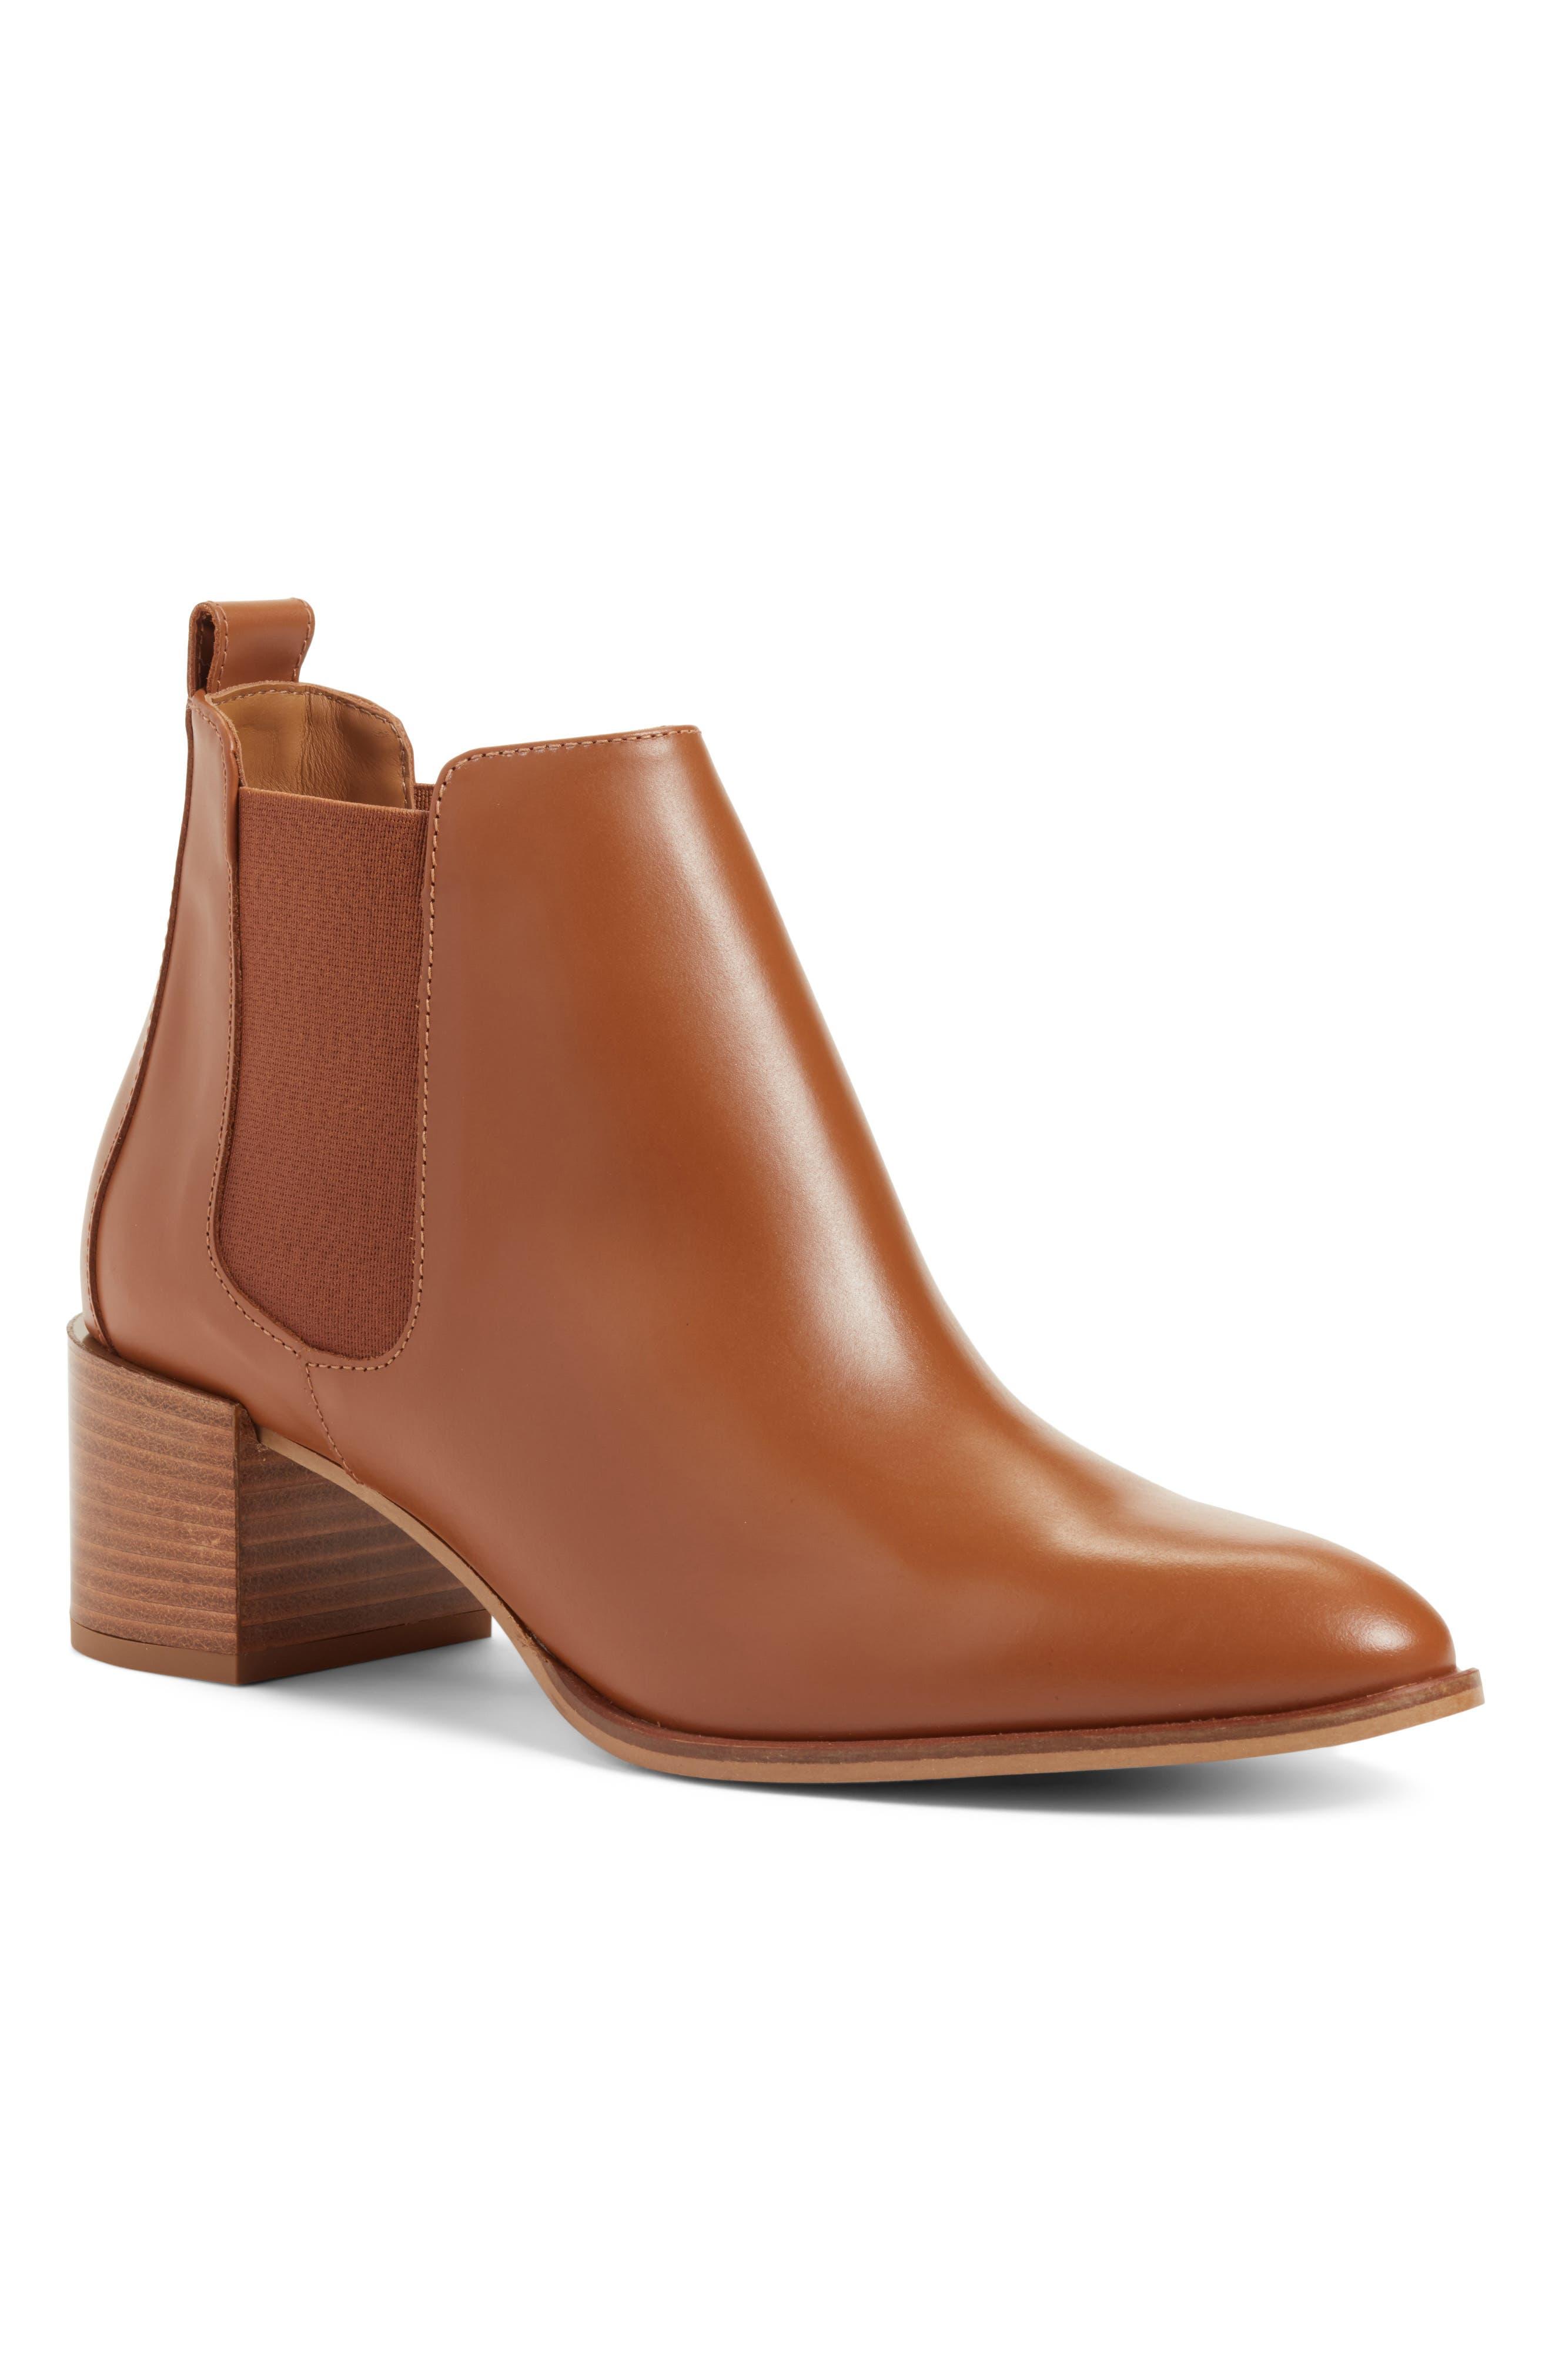 Alternate Image 1 Selected - Everlane The Heel Boot (Women)